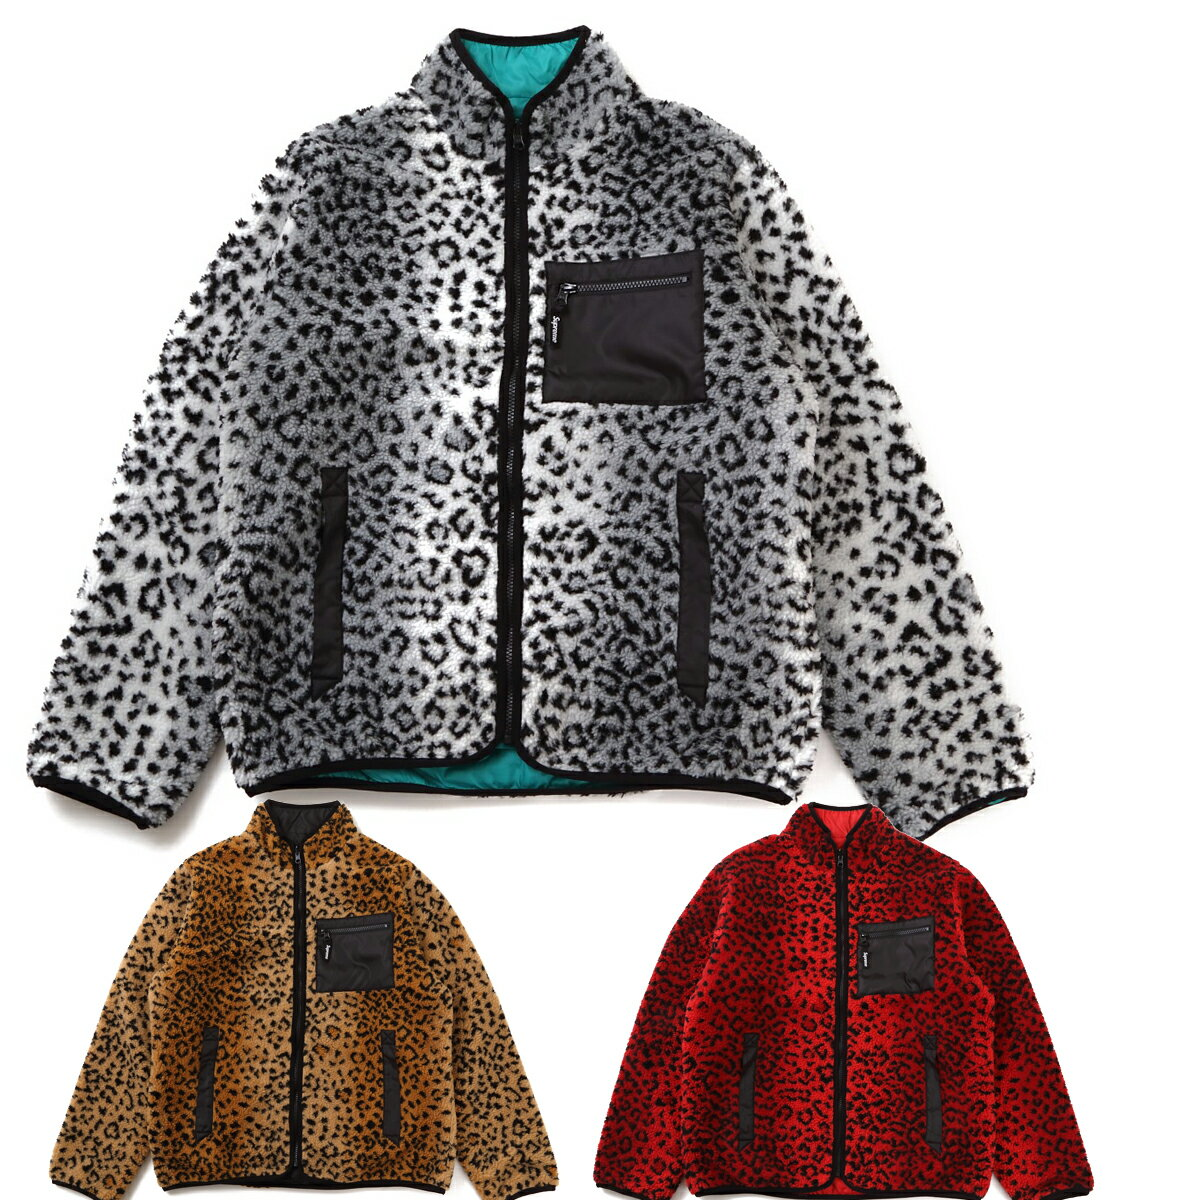 SUPREME シュプリーム Leopard Fleece Reversible Jacket アメリカ正規直営店買付分【あす楽対応_関東】